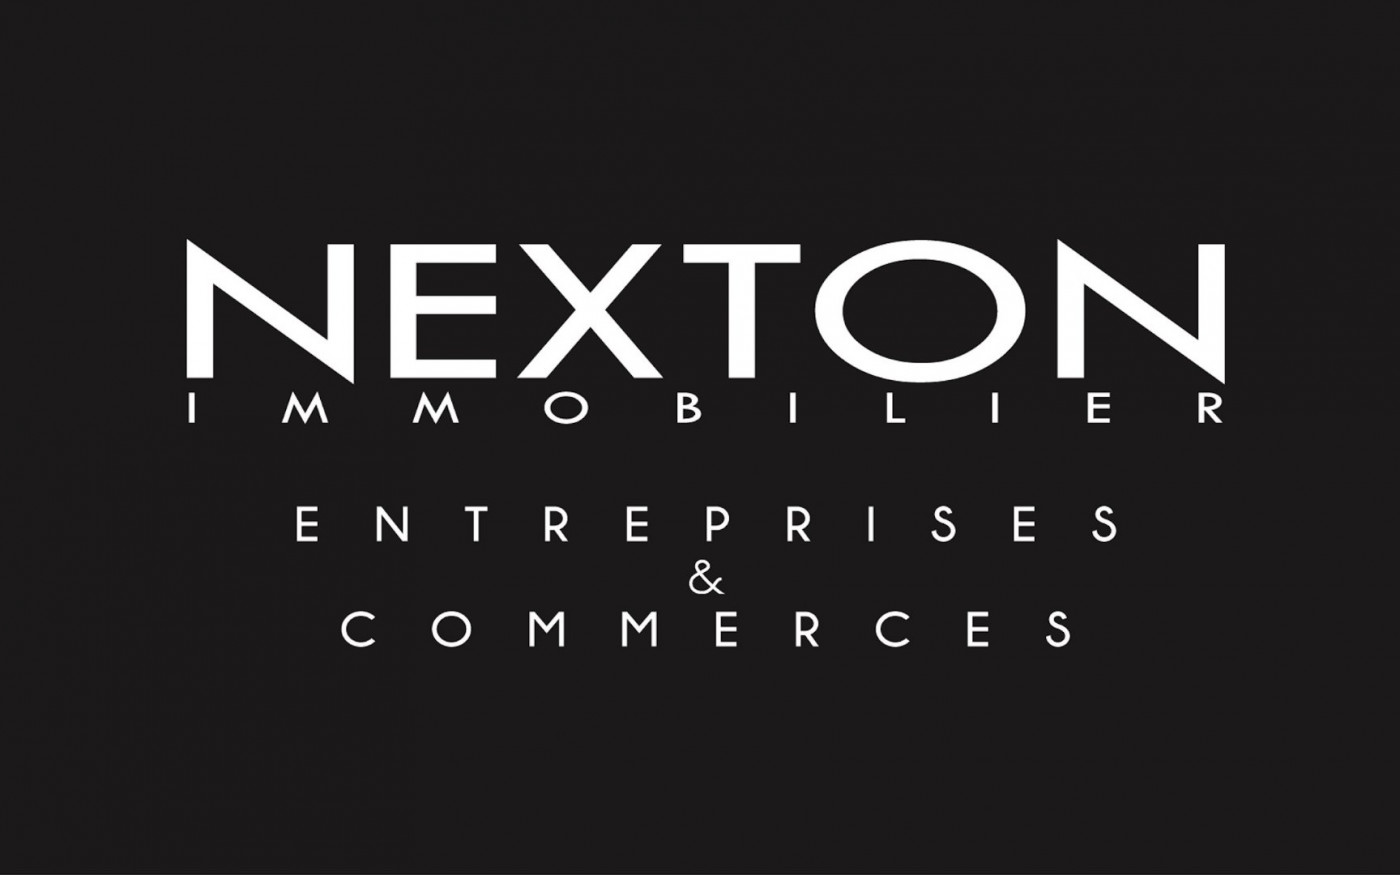 A vendre  Capbreton | Réf 40012185 - Nexton immobilier